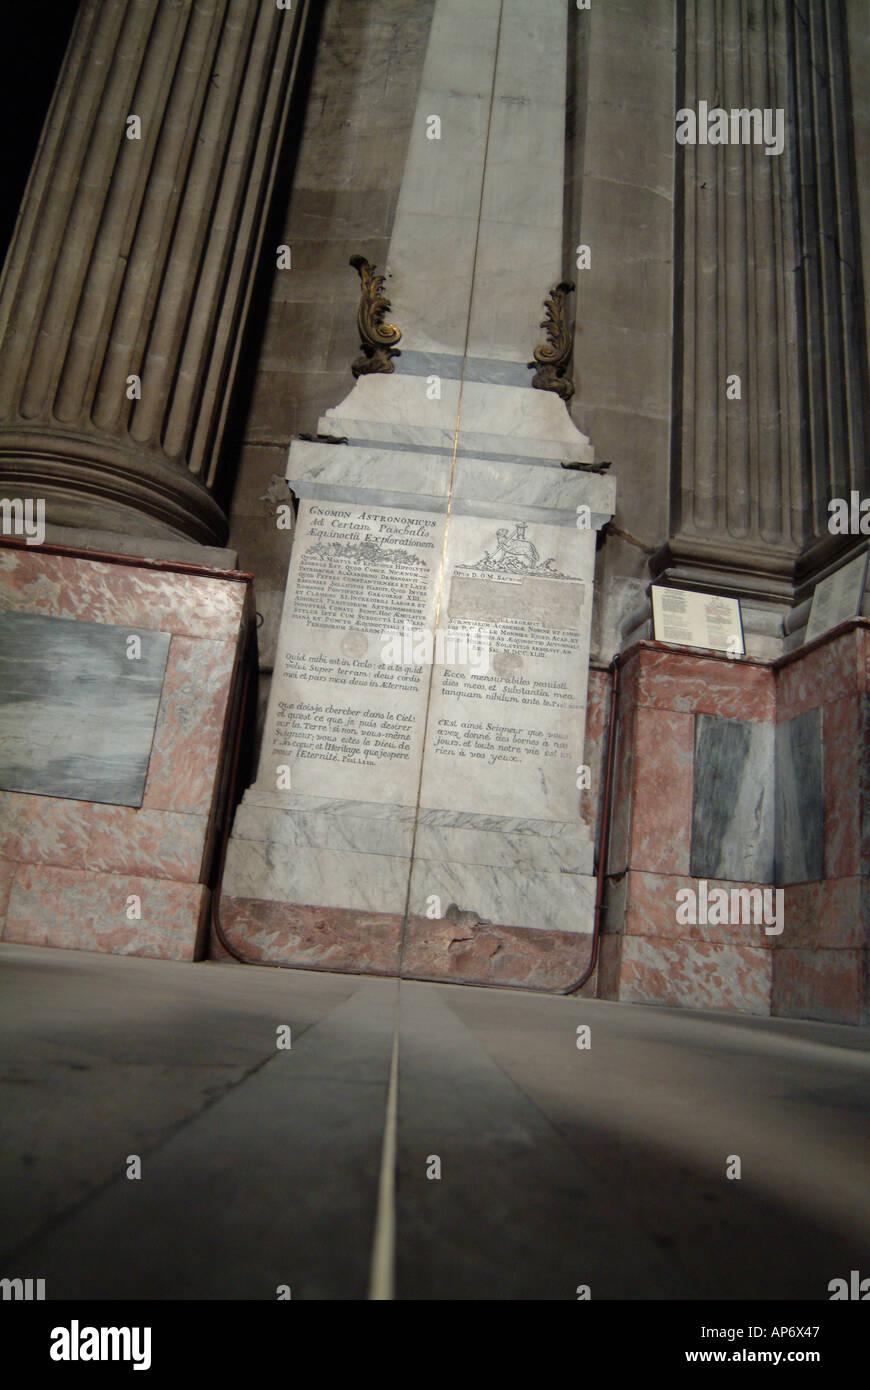 Interior De La Iglesia De Saint Sulpice En Paris Francia La Linea